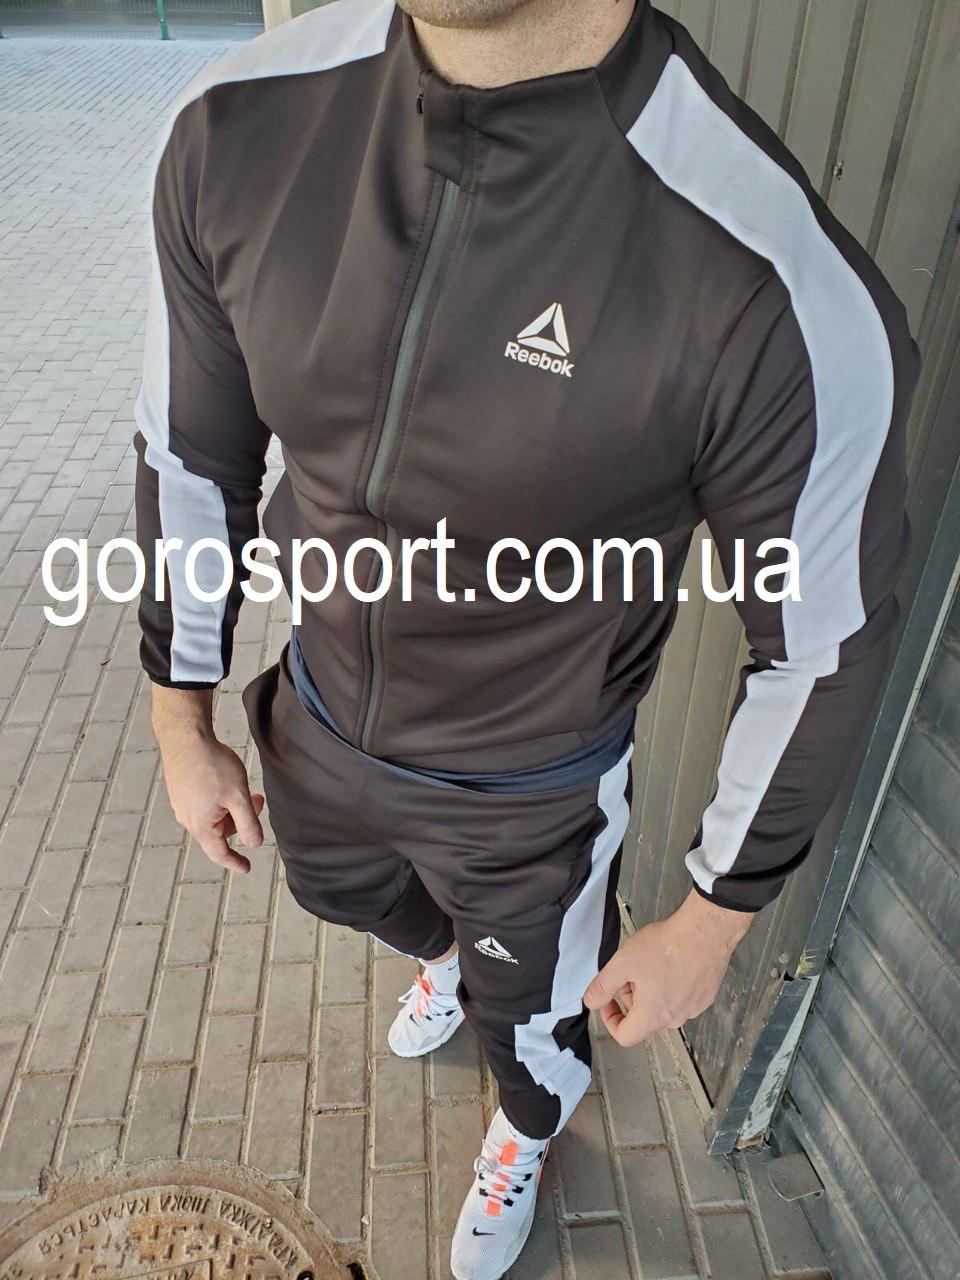 Мужской спортивный костюм Reebok Avenger